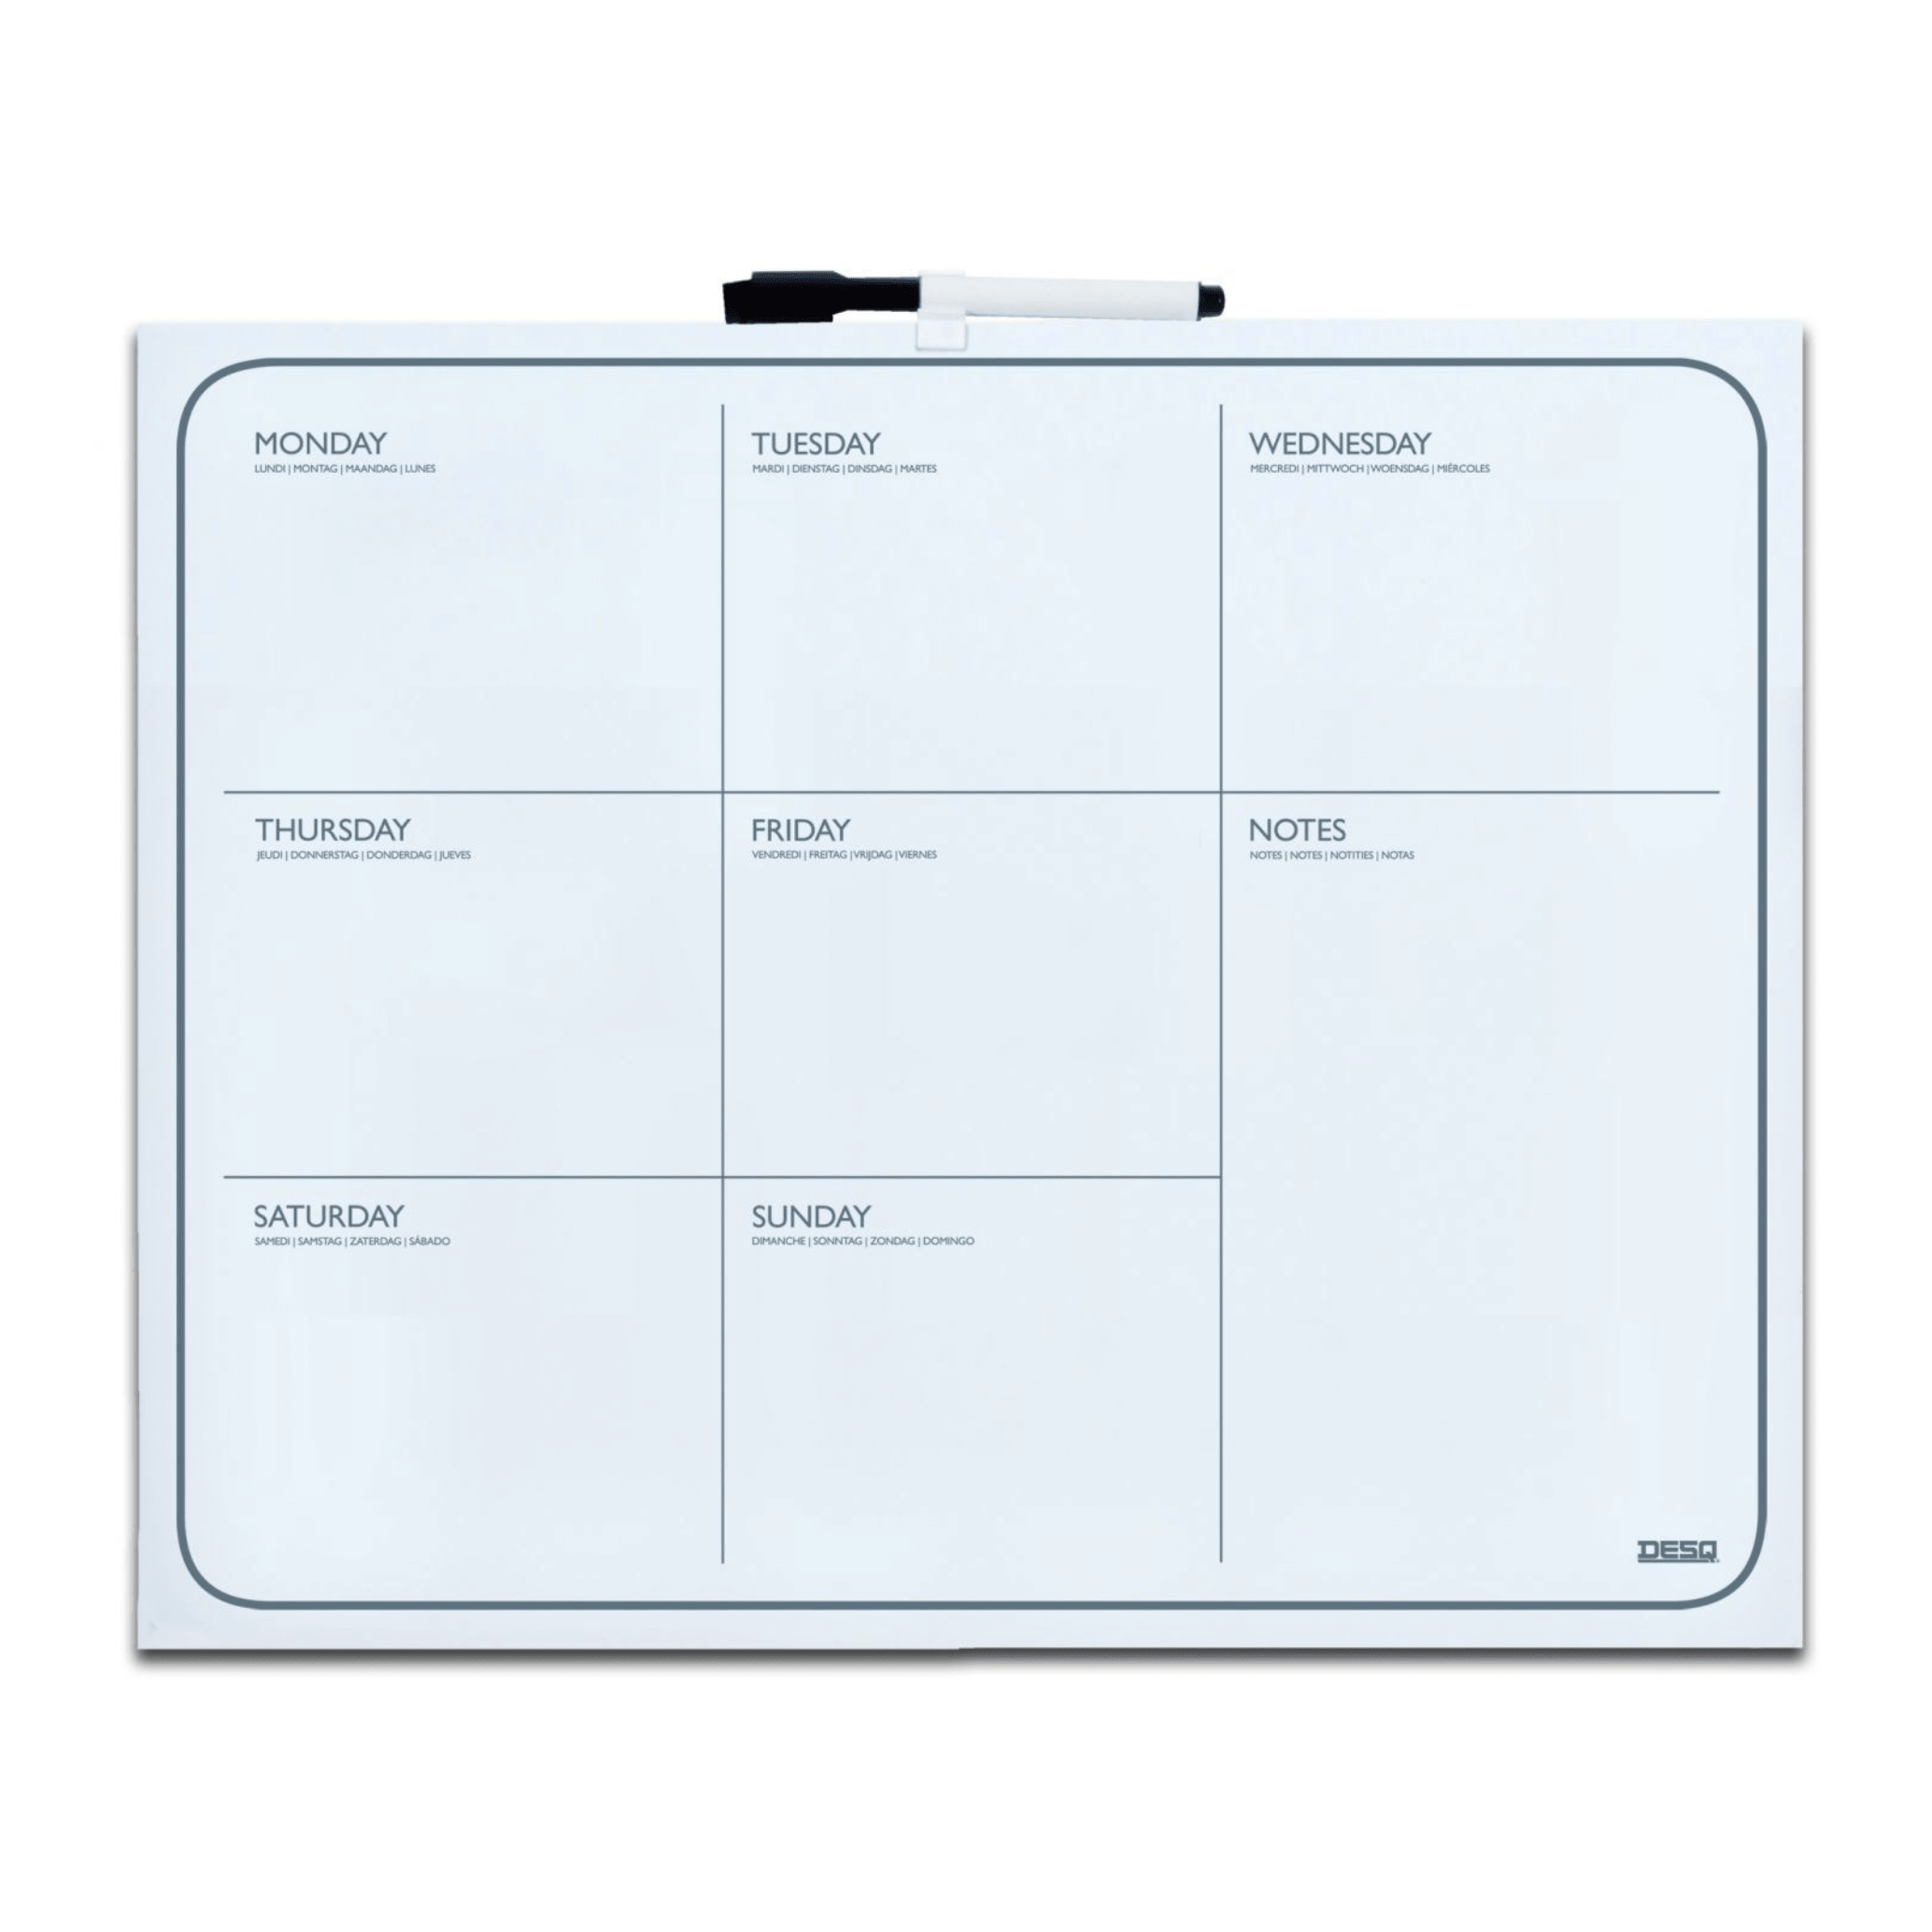 Tabla magnetica planificator saptamanal